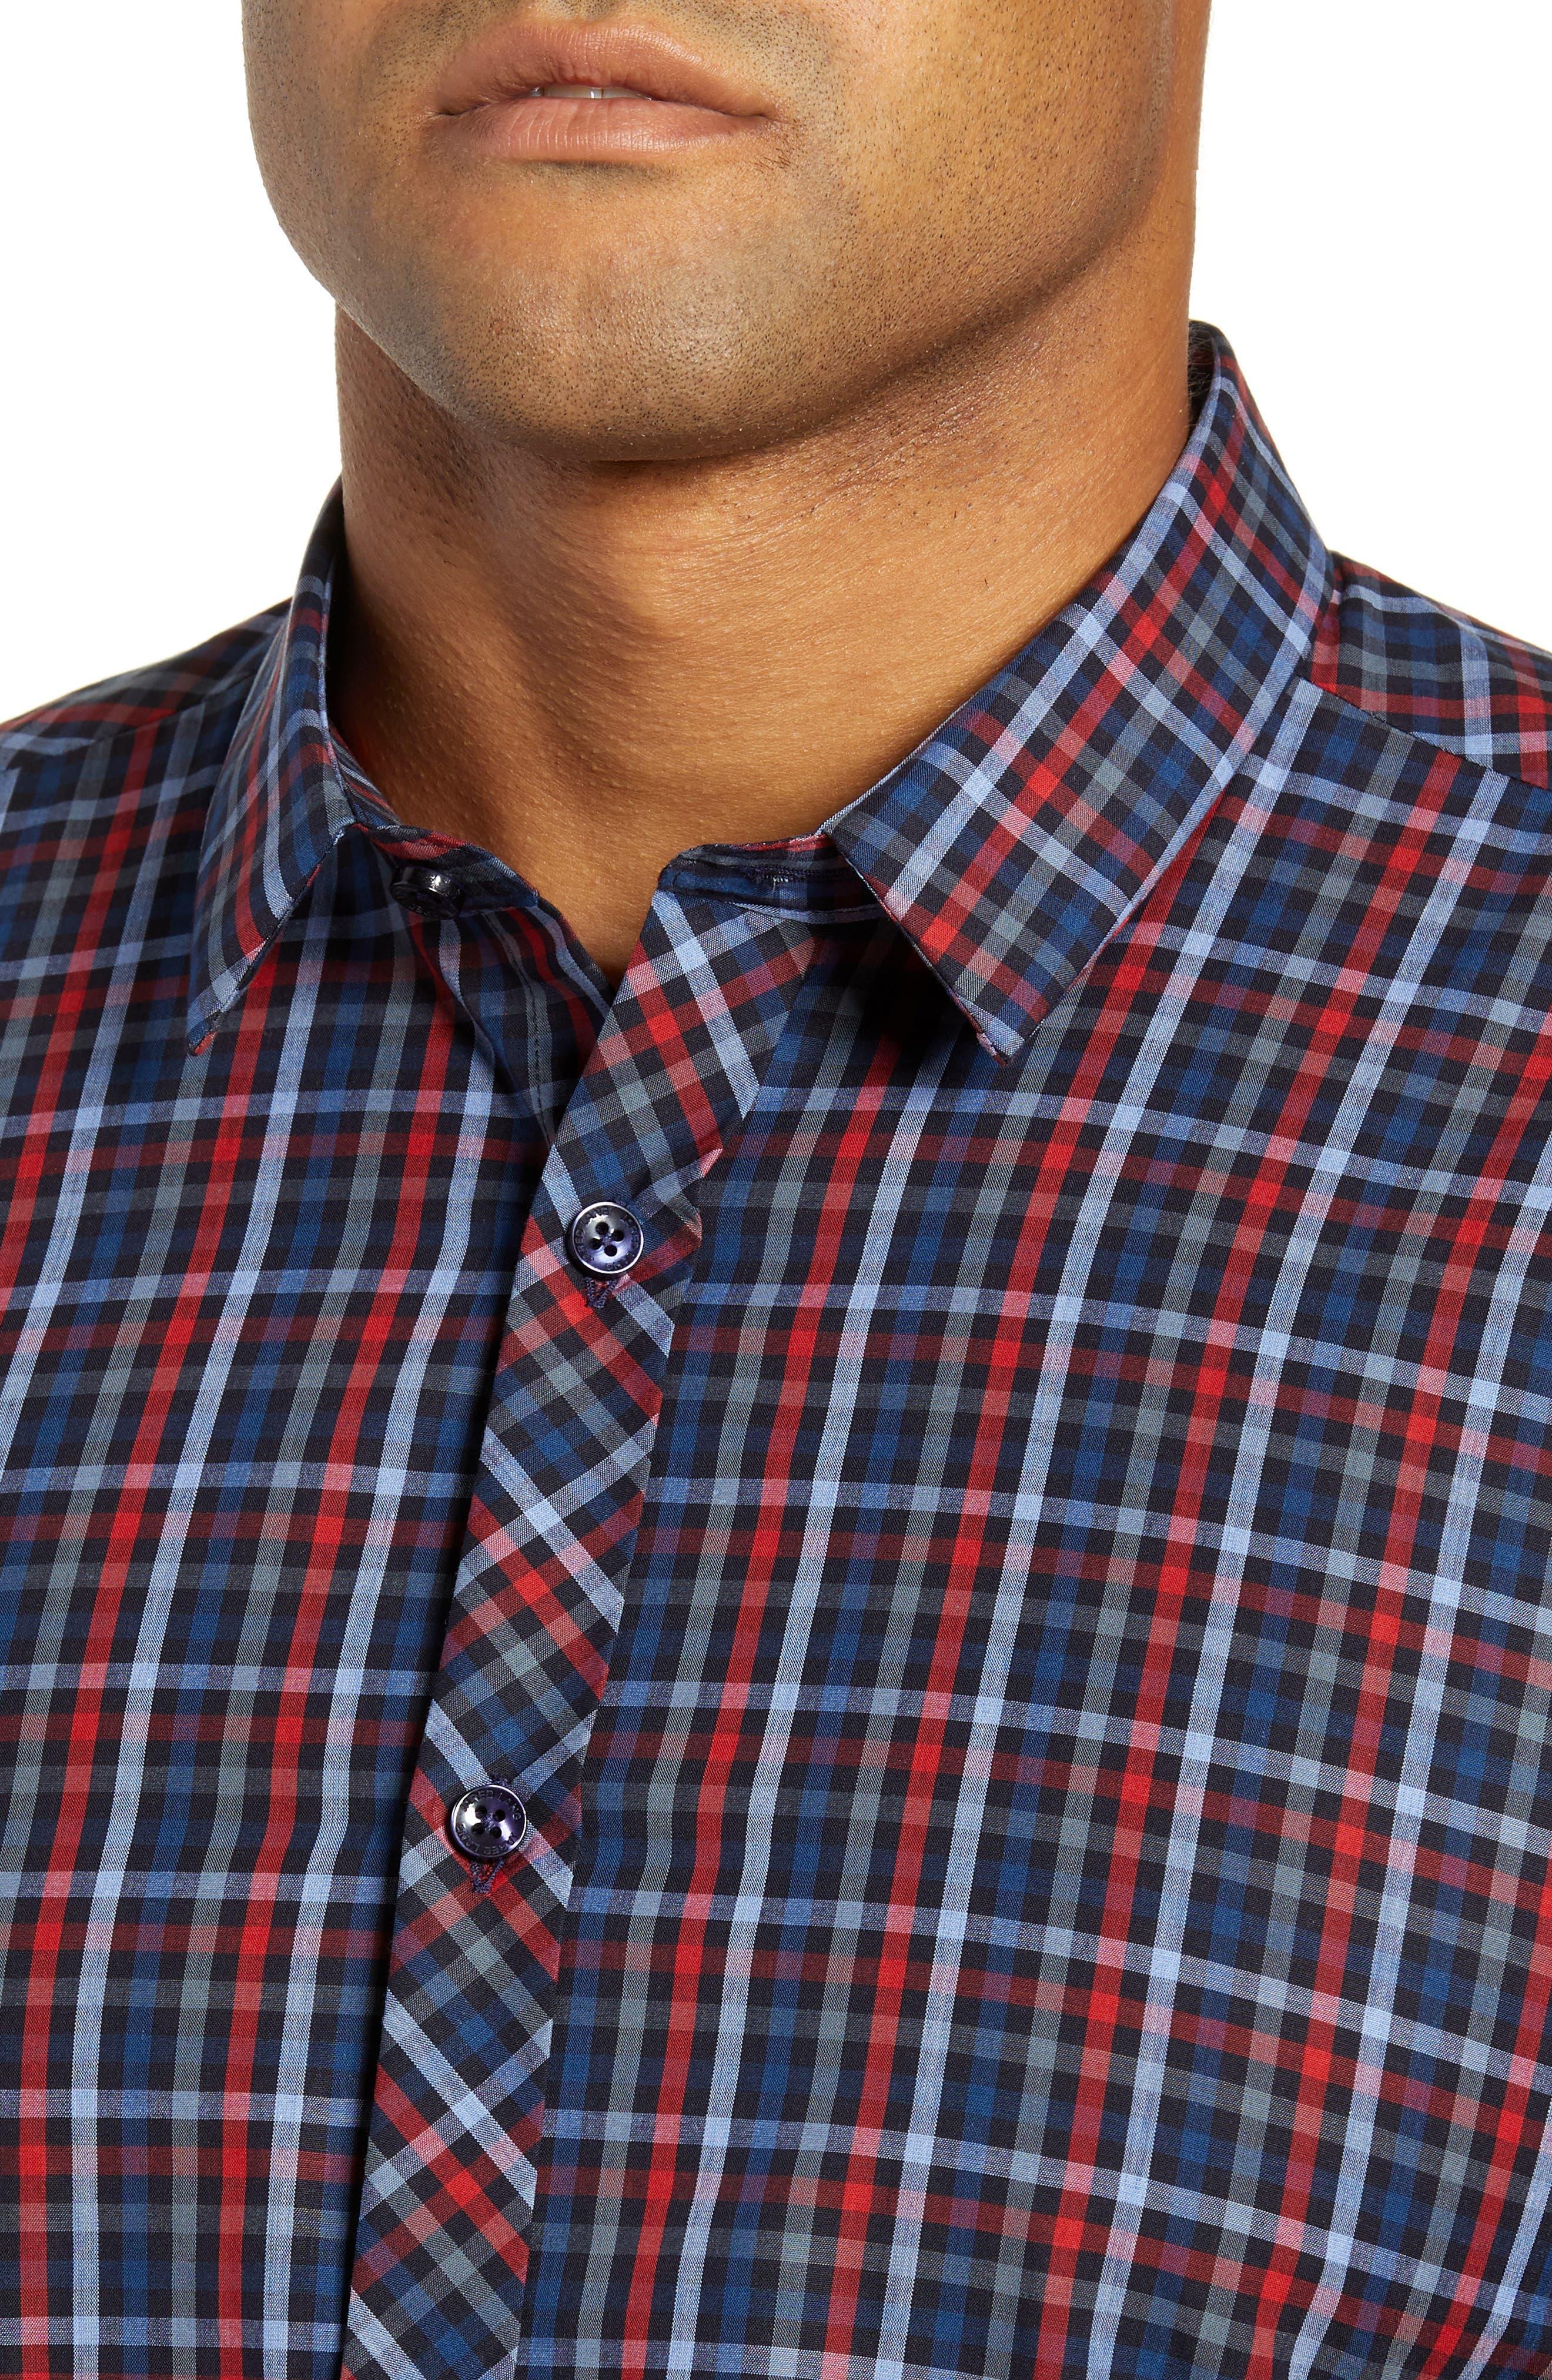 Trim Fit Sport Shirt,                             Alternate thumbnail 2, color,                             RED - BLUE MULTI CHECK